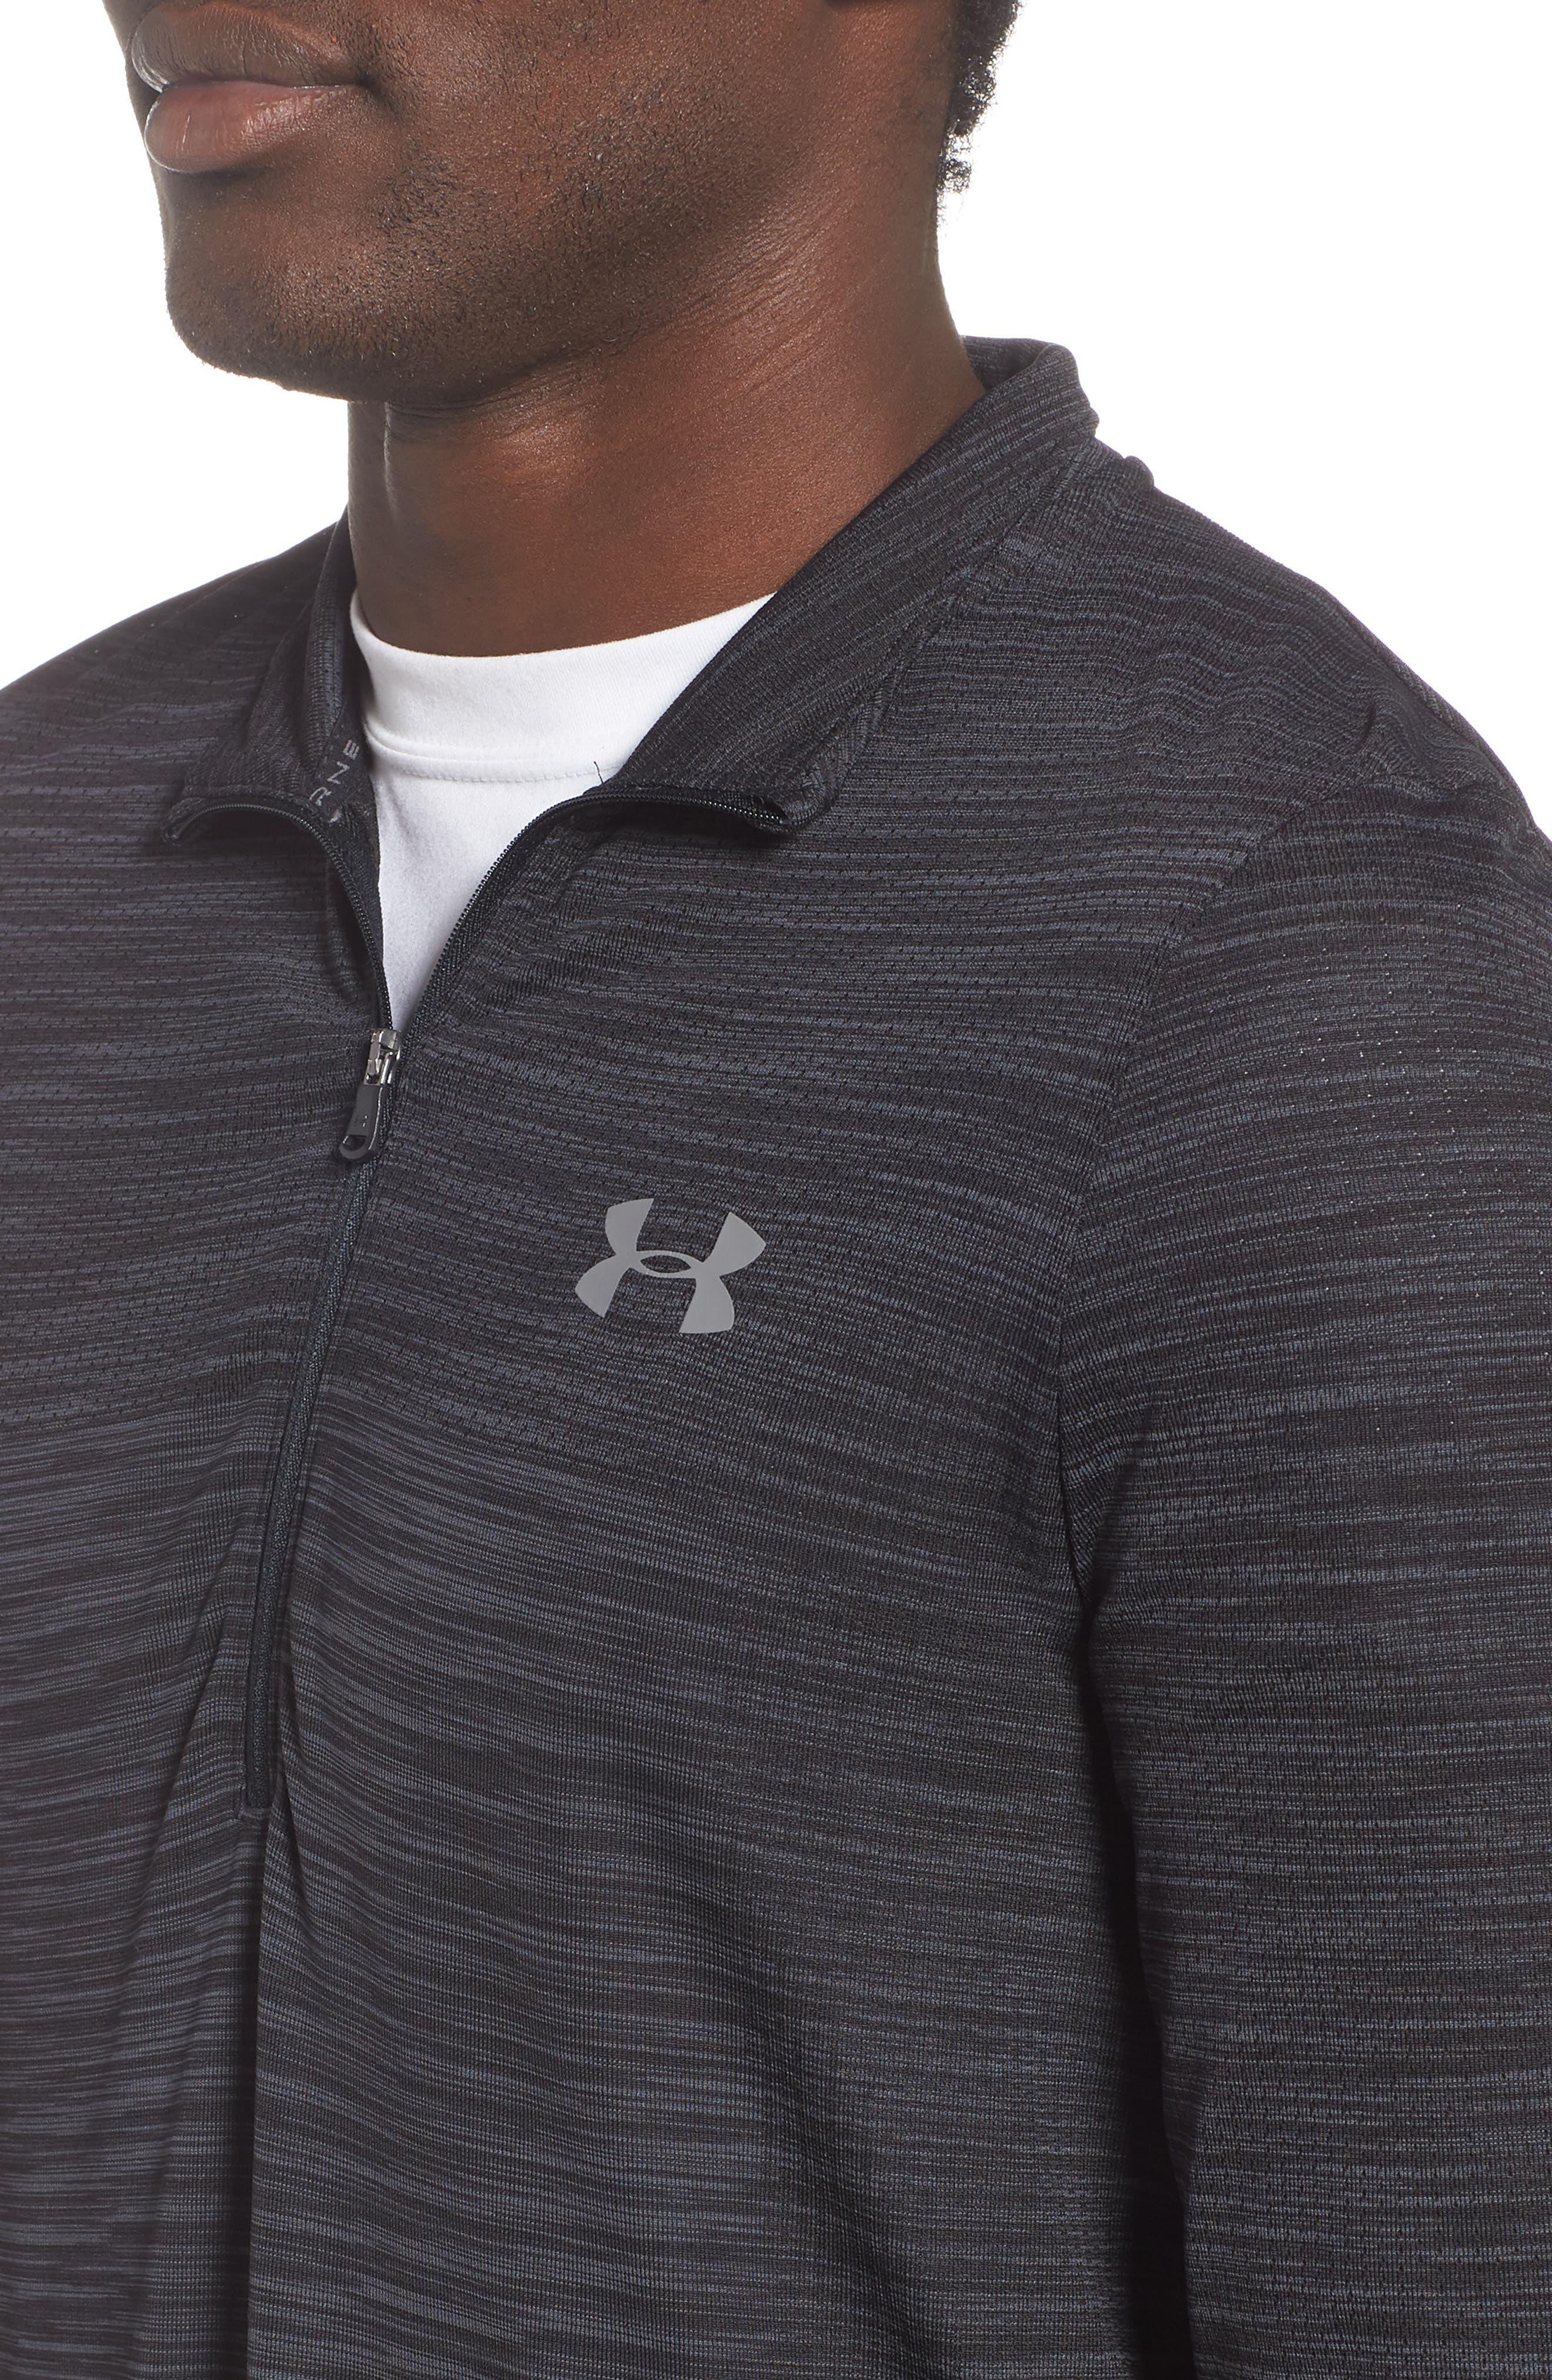 Siphon Regular Fit Half-Zip Pullover,                             Alternate thumbnail 4, color,                             BLACK